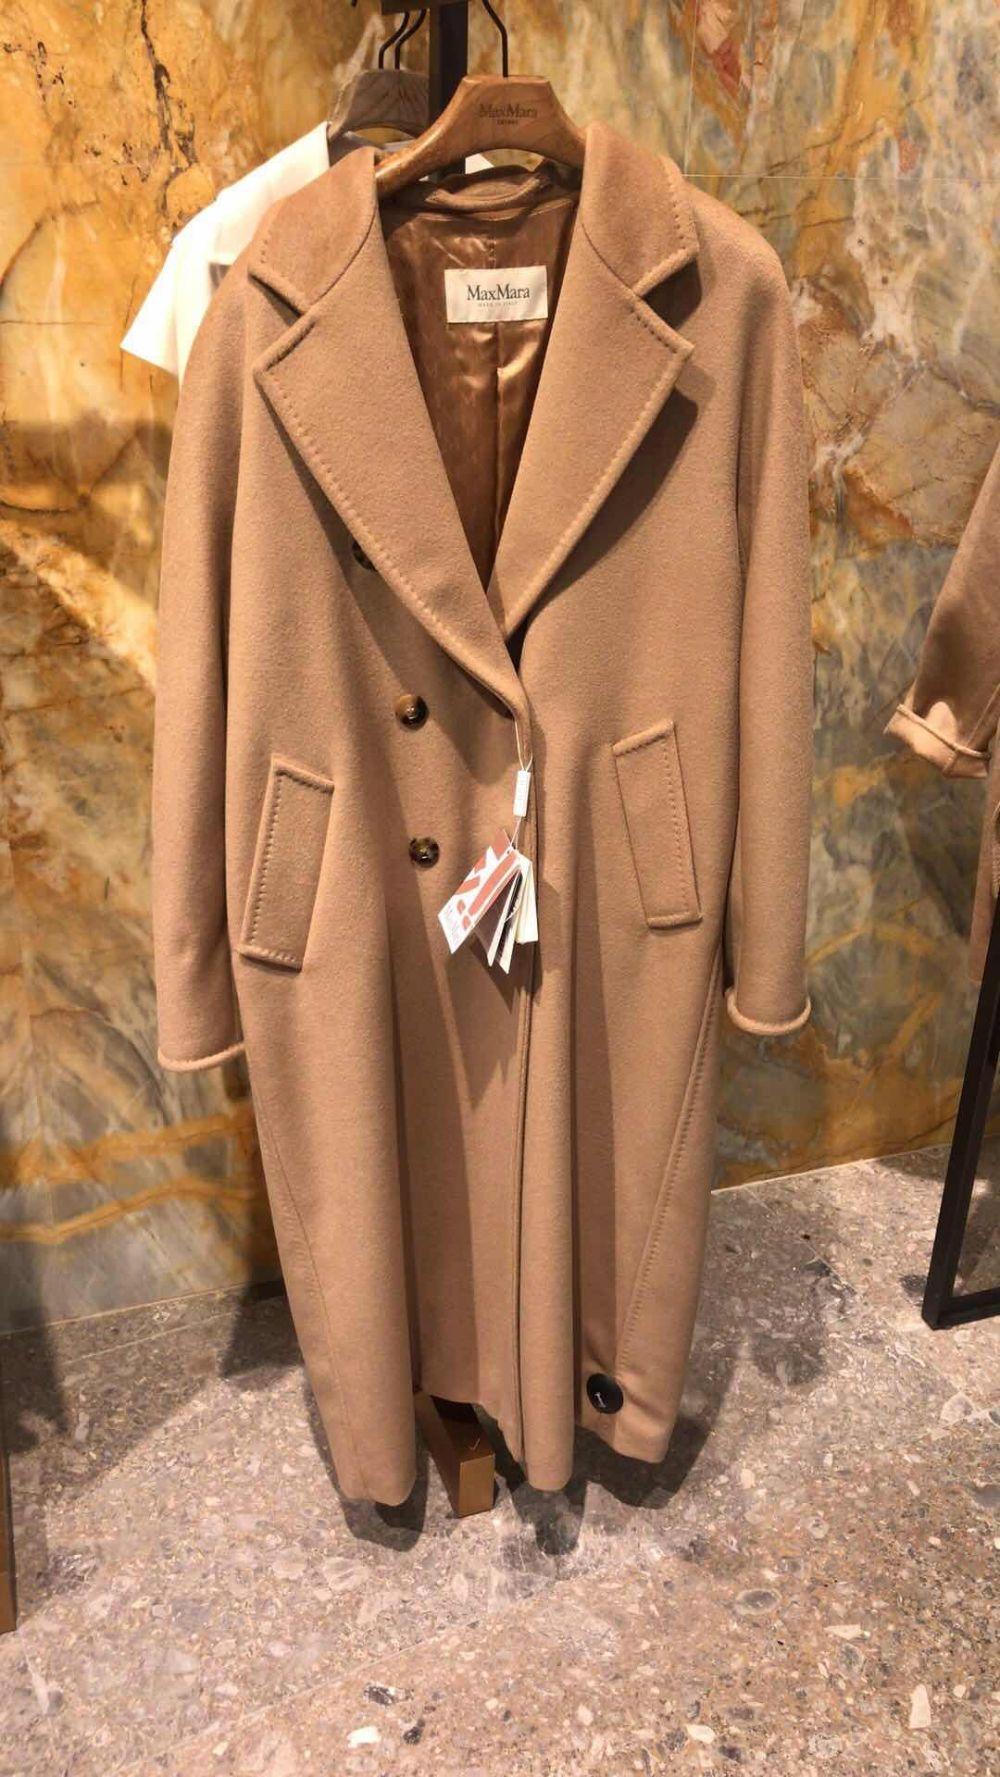 Max mara麦丝玛拉女士羊绒系带长款大衣外套101801